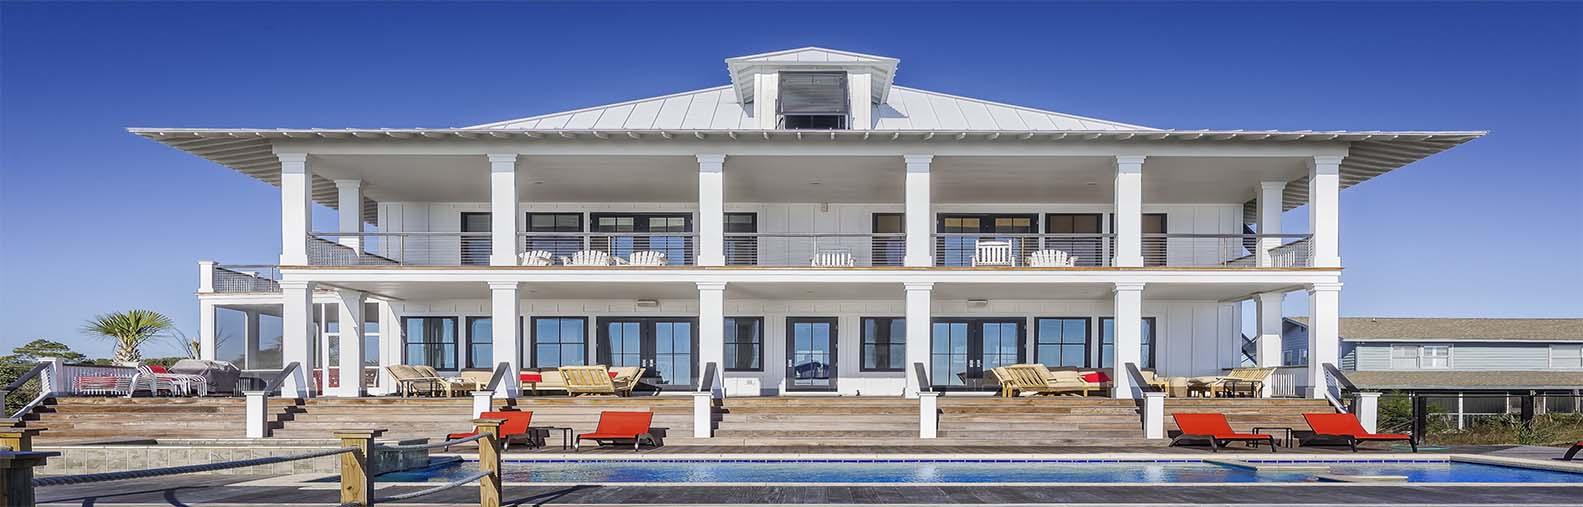 myrtlebeach-homes-for-sale